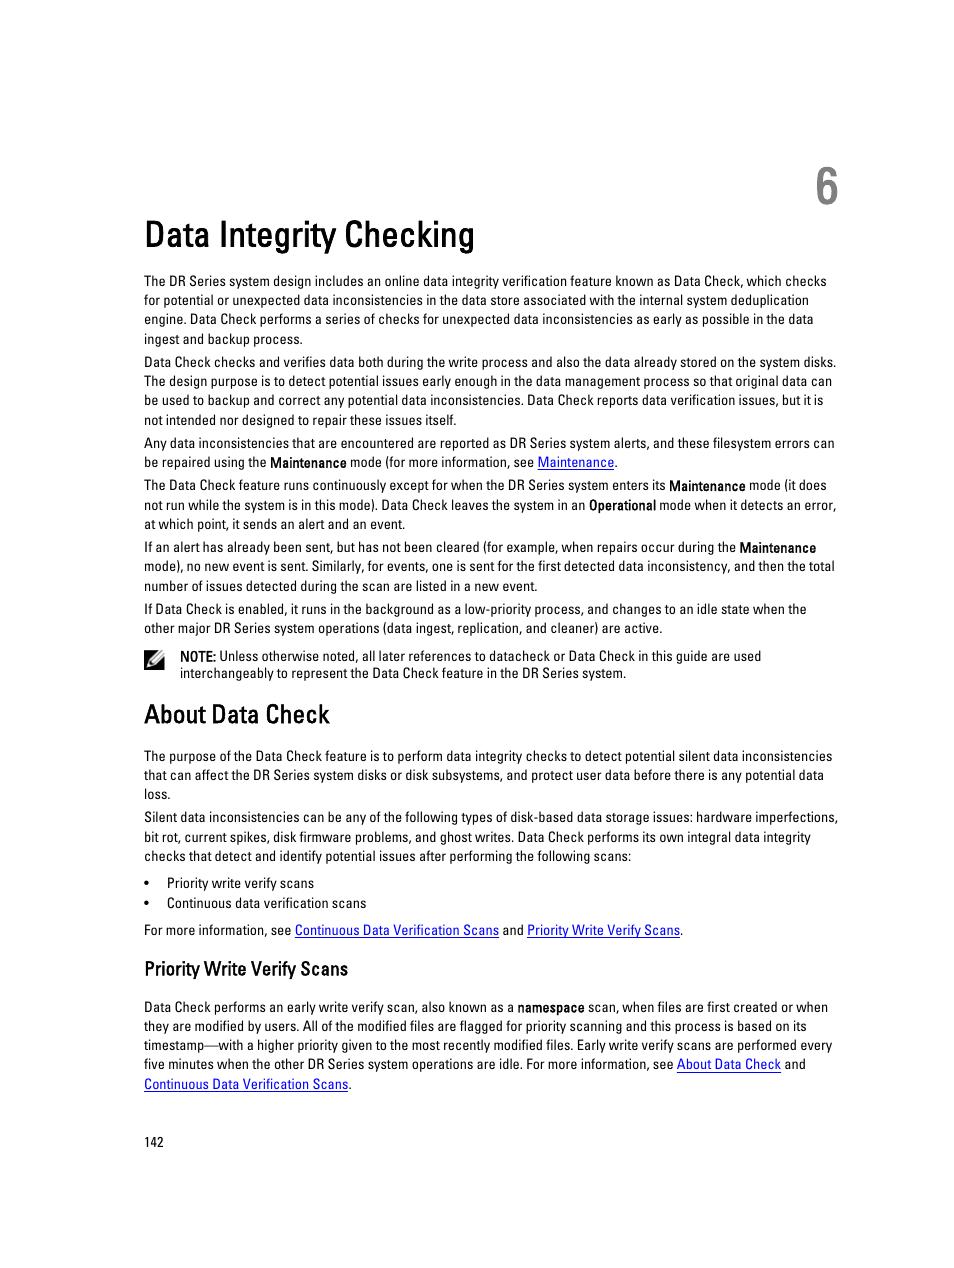 data integrity checking about data check priority write verify rh manualsdir com Online User Guide User Guide Template